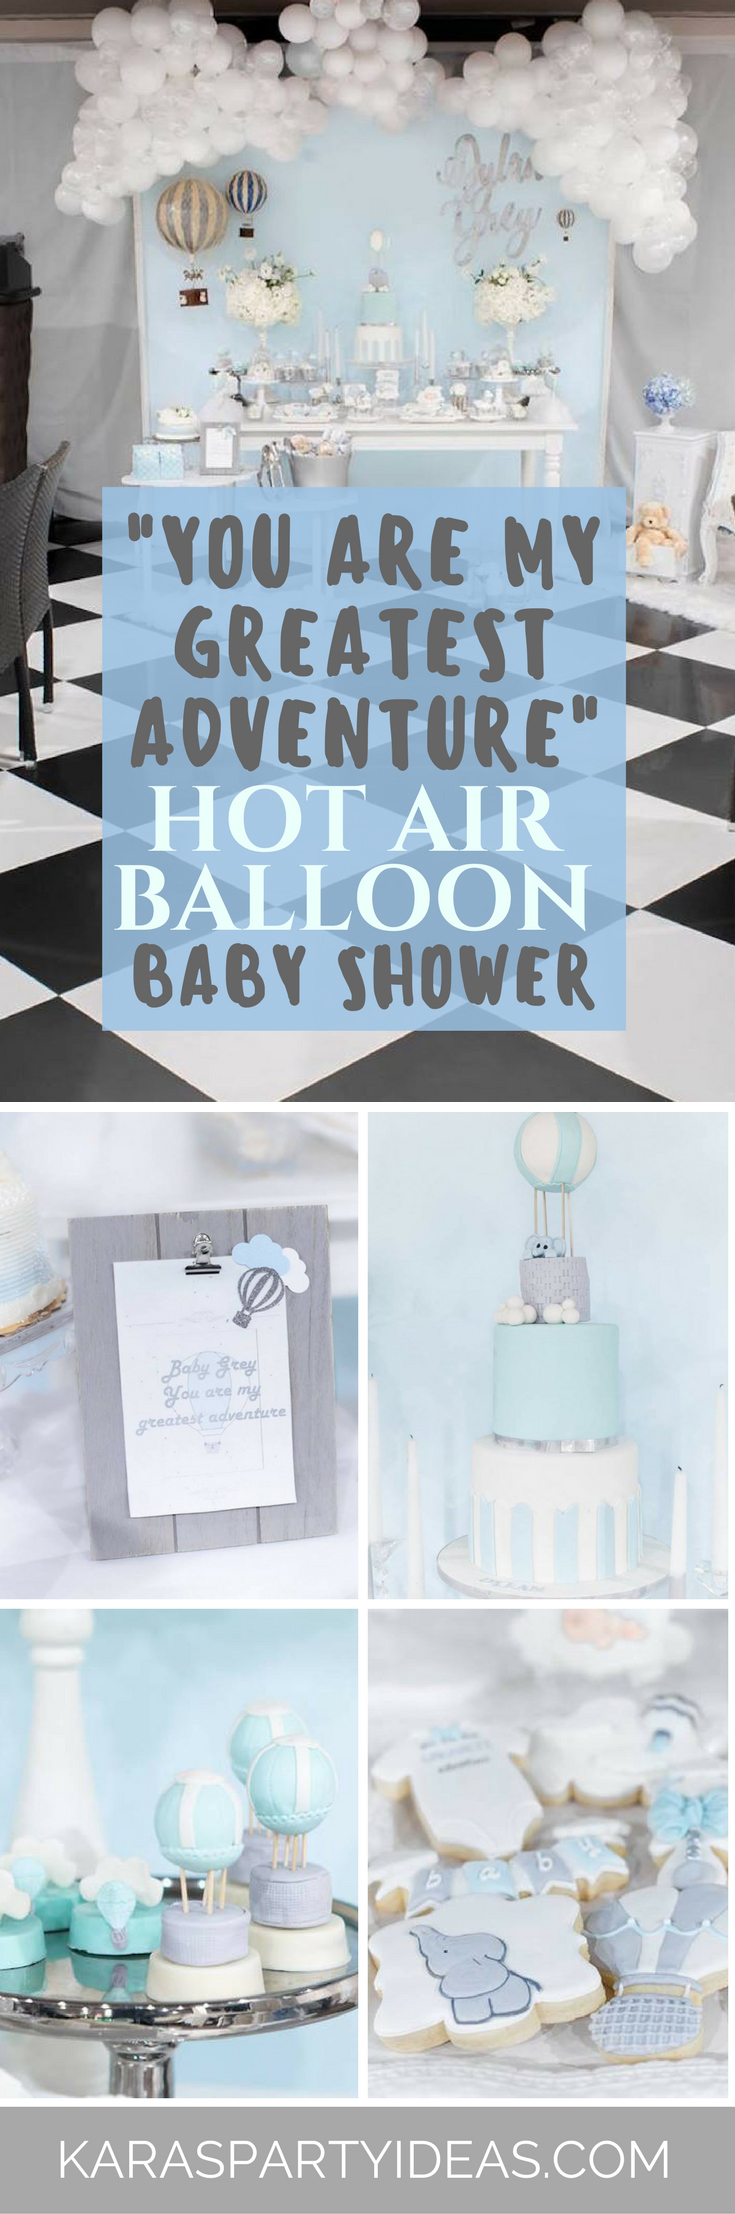 You are My Greatest Adventure Hot Air Balloon Baby Shower via Kara's Party Ideas - KarasPartyIdeas.com (1)